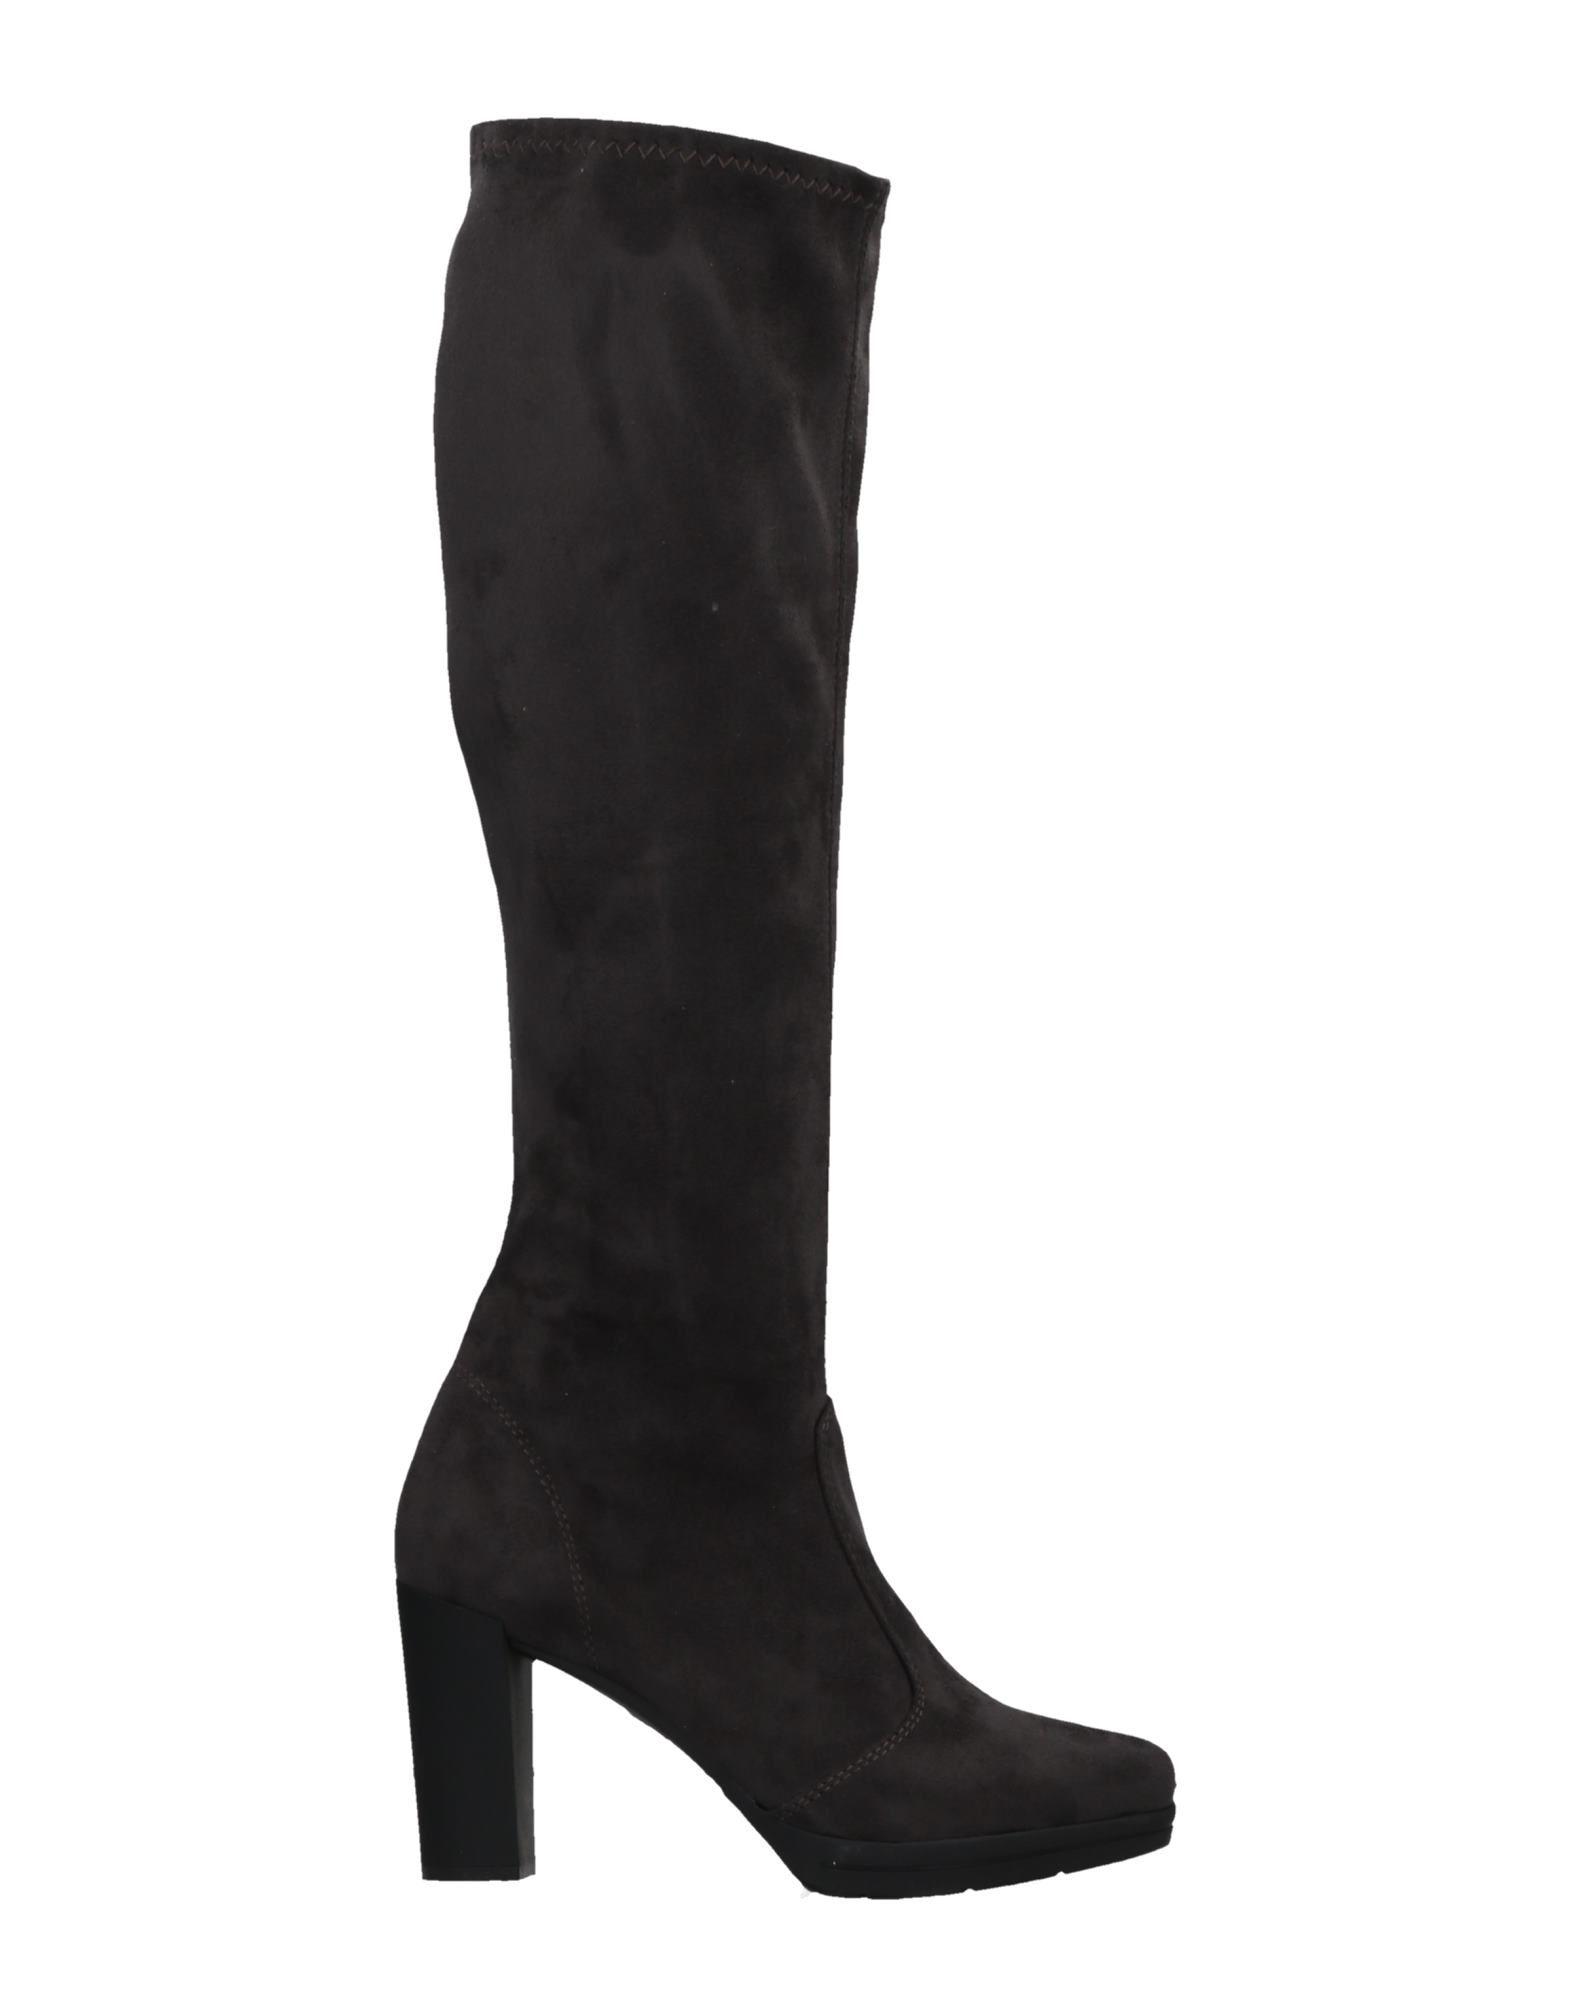 Nr Nr Rapisardi Boots - Women Nr Nr Rapisardi Boots online on  United Kingdom - 11521368AU 246e90